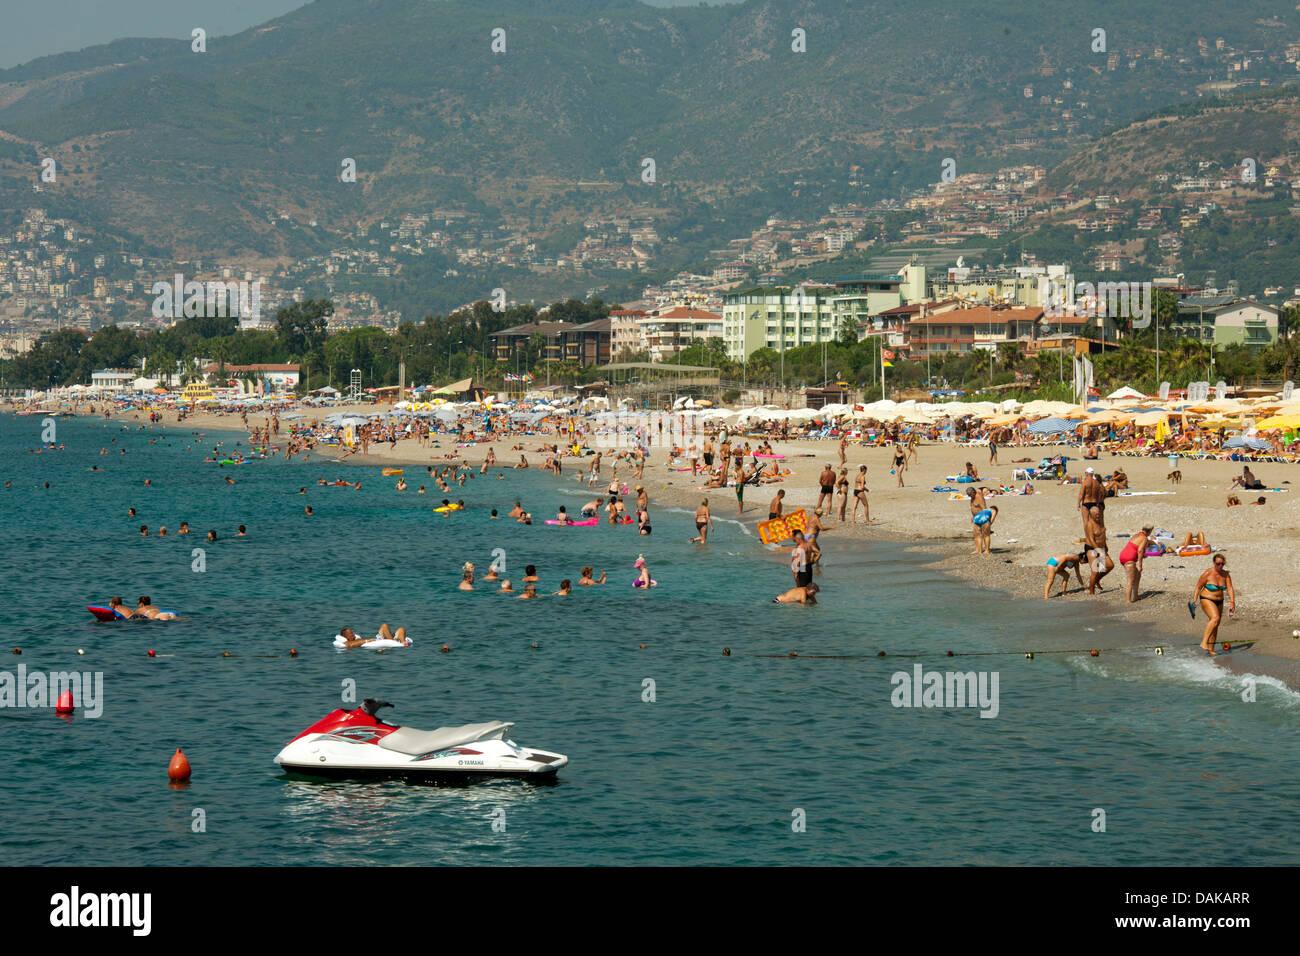 Türkei, Provinz Antalya, Alanya, Oststrand - Stock Image